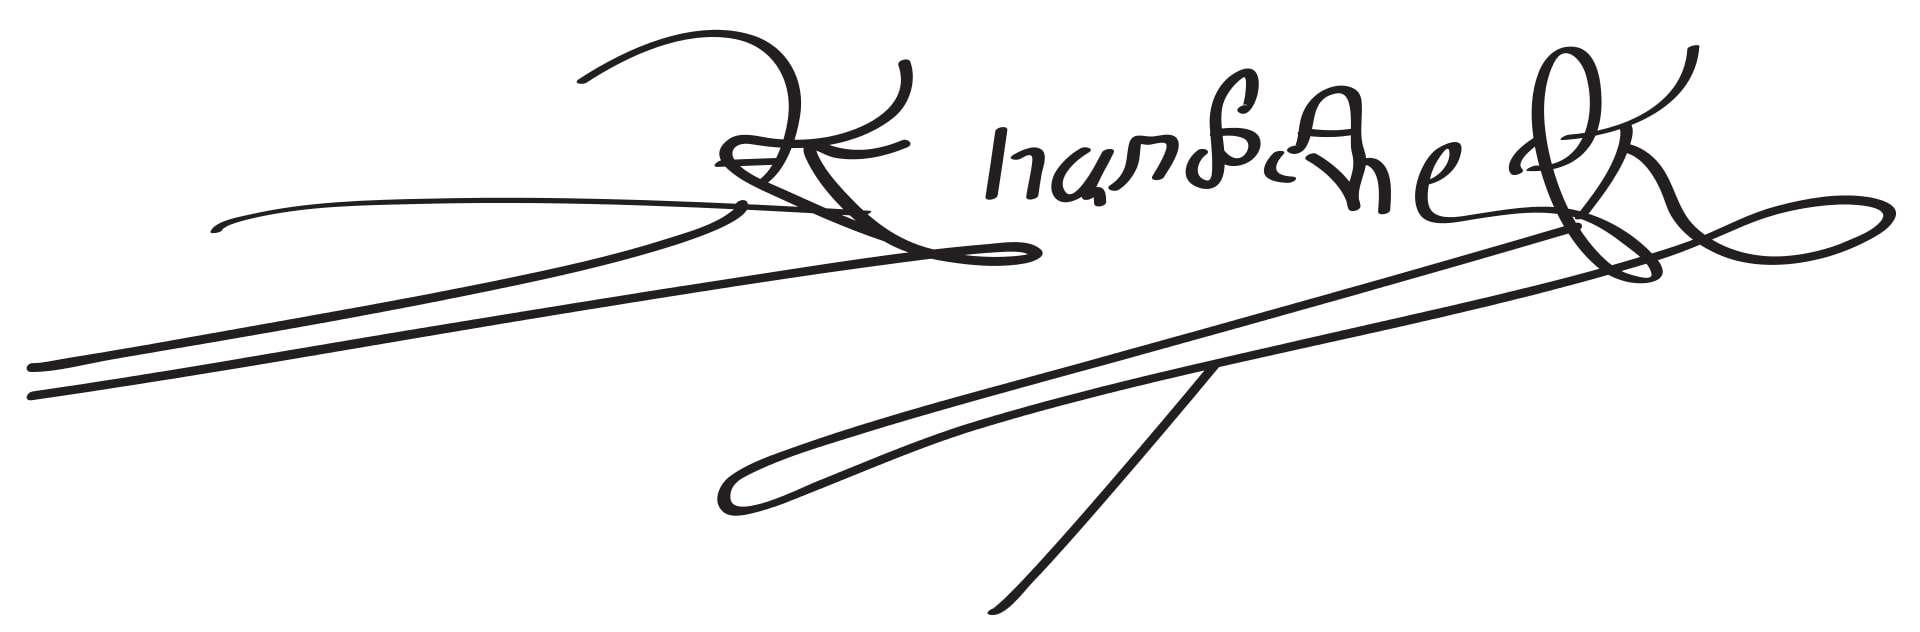 Hernán Cortés Signature